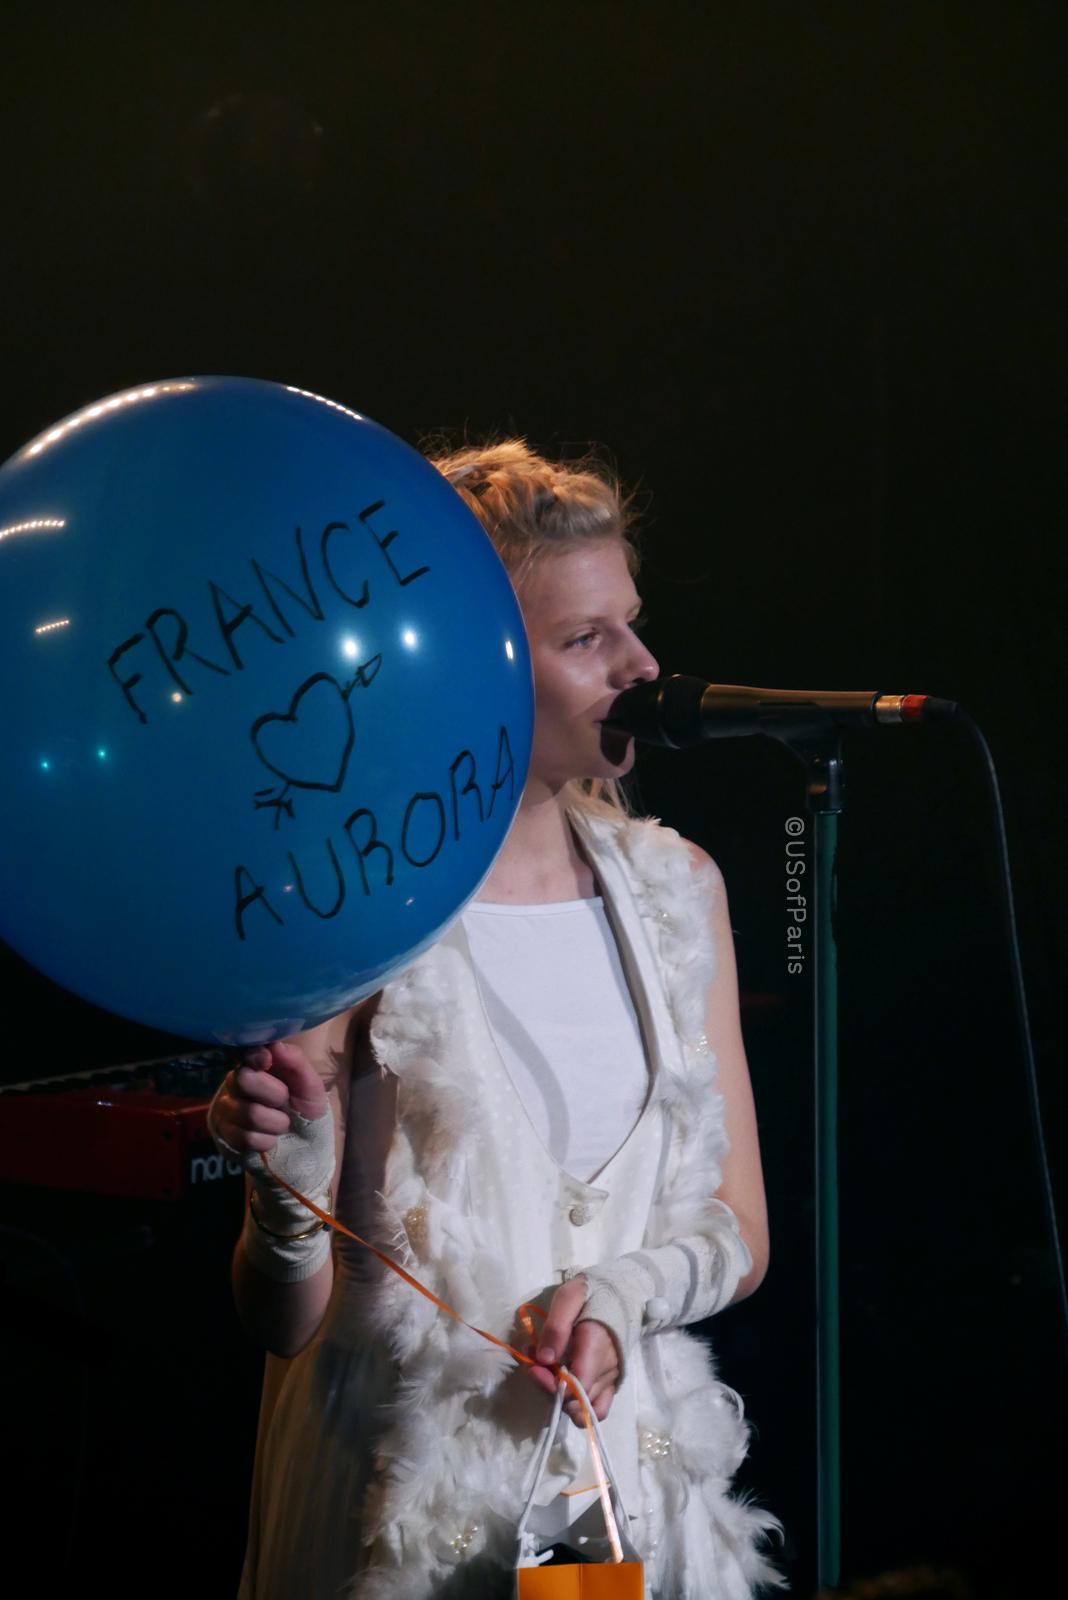 aurora-music-live-concert-paris-la-maroquinerie-balloon-french-fan-gift-stage-photo-usofparis-blog